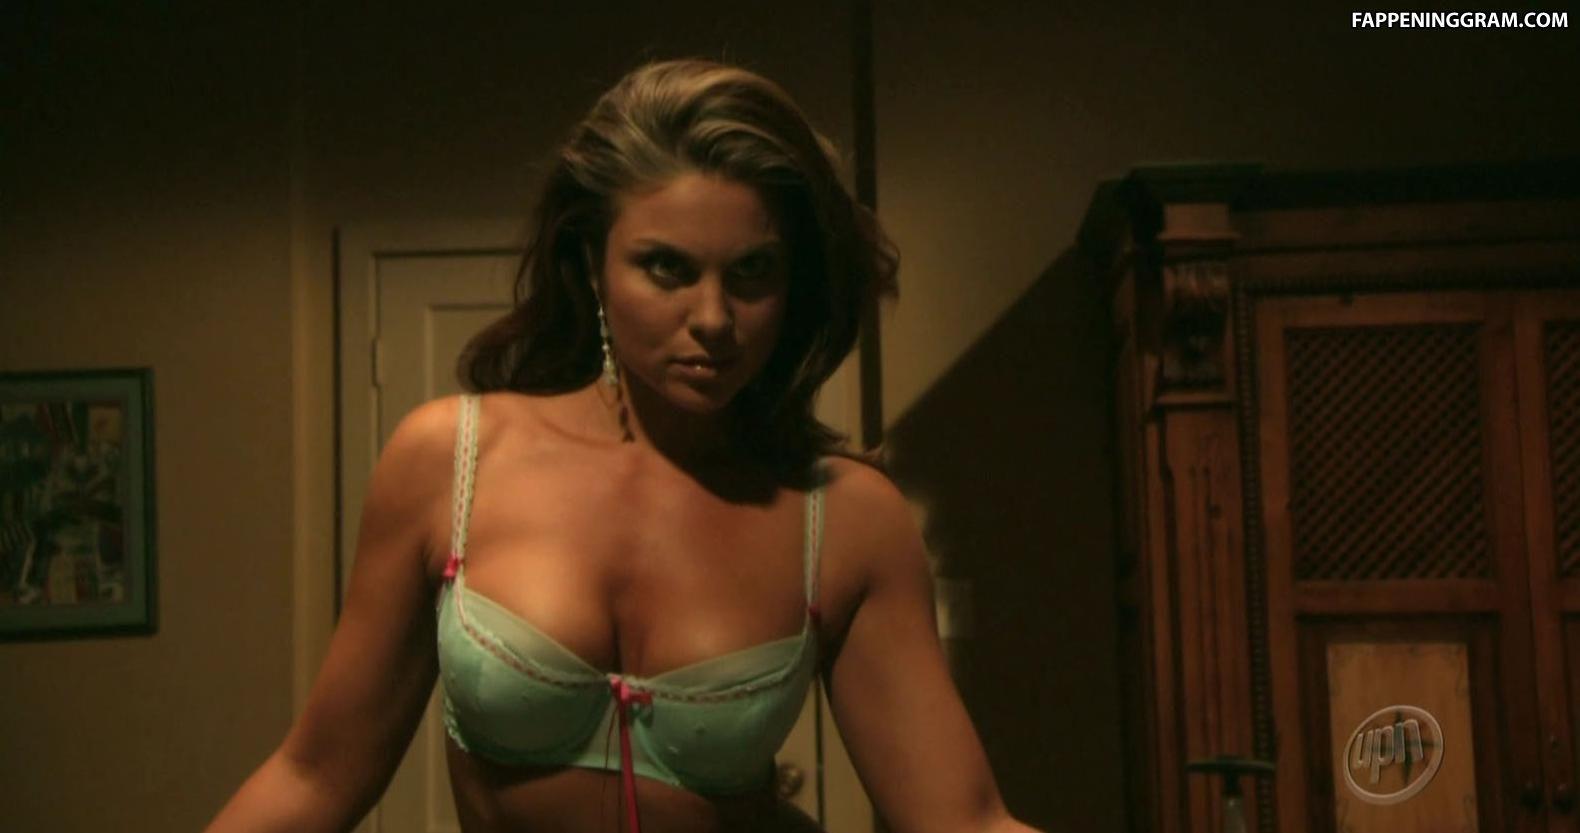 Nadia Bjorlin Naked